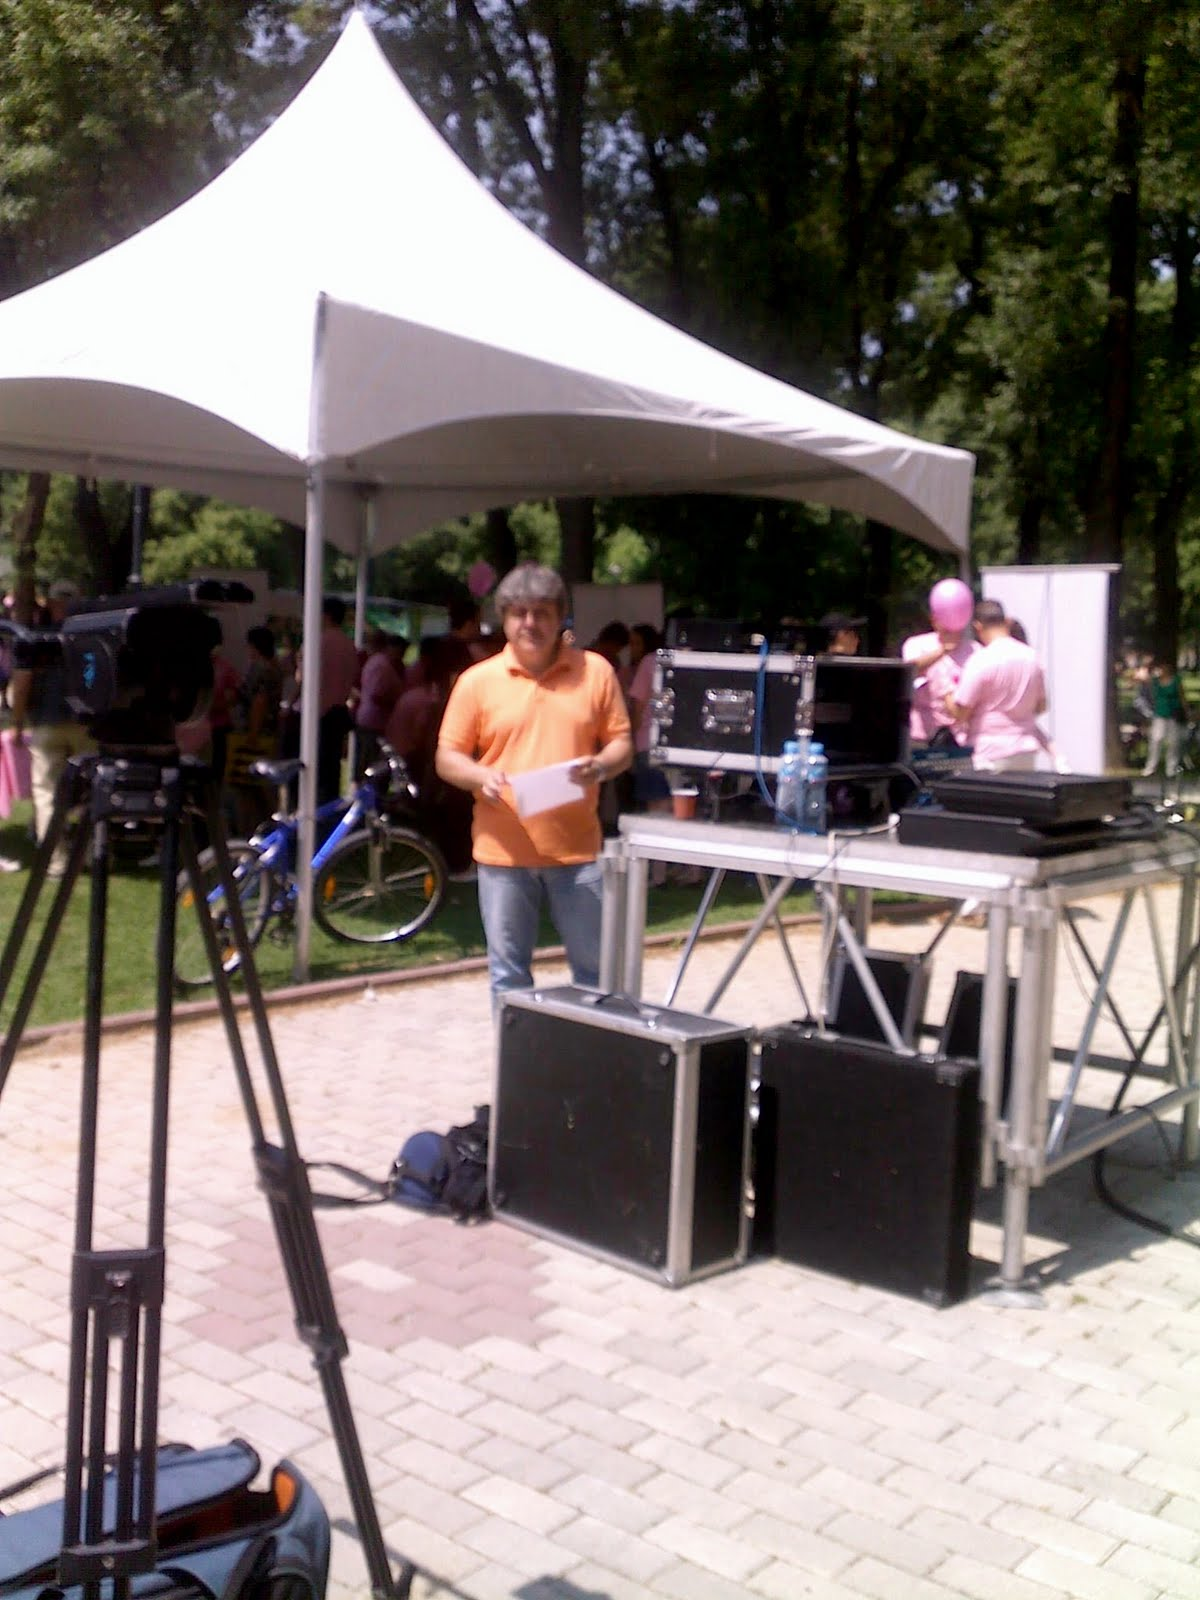 http://1.bp.blogspot.com/-wJlgGWCfhNQ/TeY-PAOlnRI/AAAAAAAAA1c/g-ghXb-AZLE/s1600/Event+Rozovo%252C+City+Park%252C+Skopje%252C+May+2011.jpg